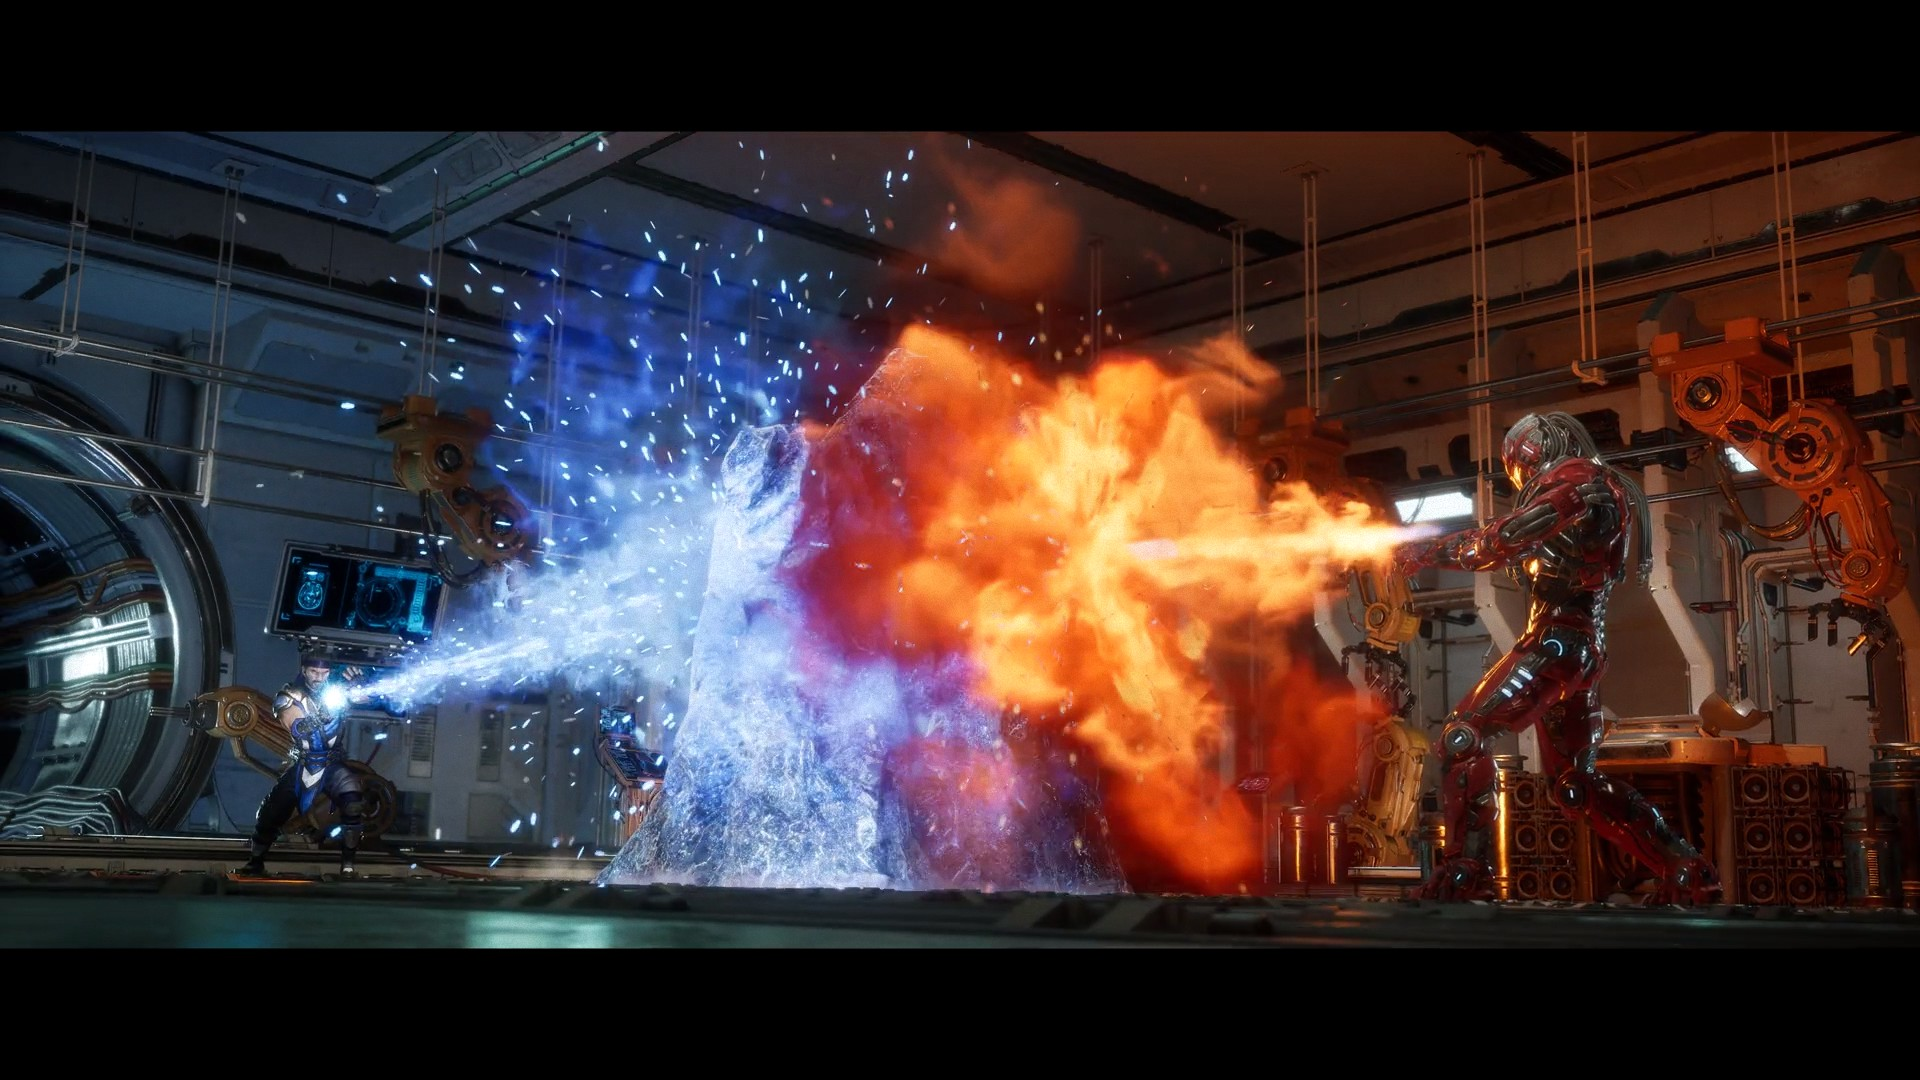 20190424140202_1.jpg - Mortal Kombat 11